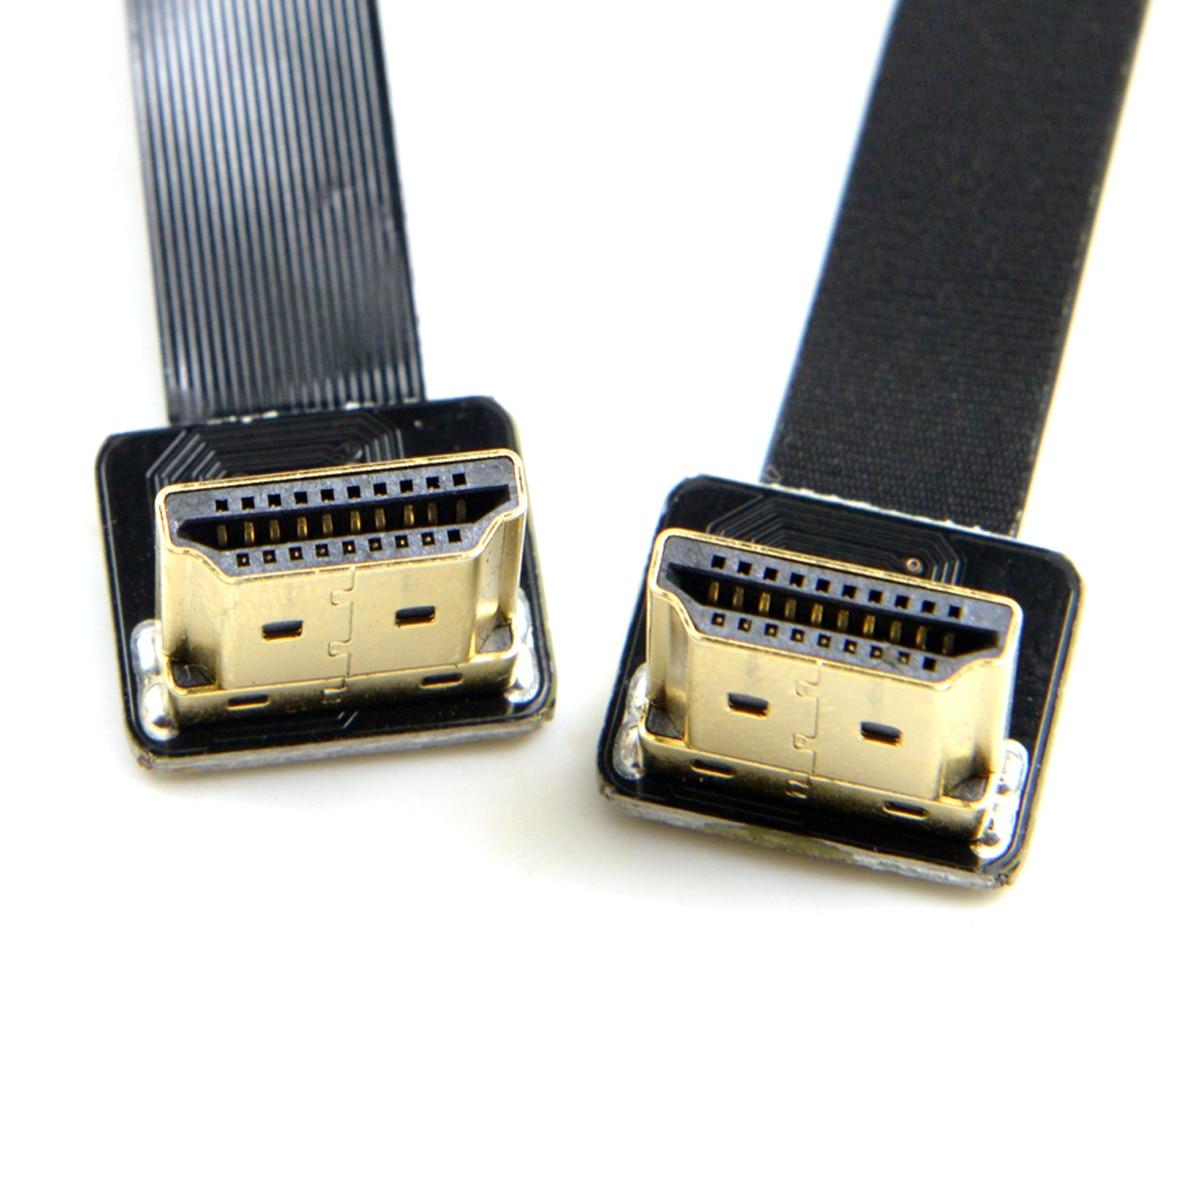 CYFPV Dual Up Angled 90 grados HDMI tipo A macho HDTV FPC Cable plano 50cm para FPV HDTV multicóptero fotografía aérea